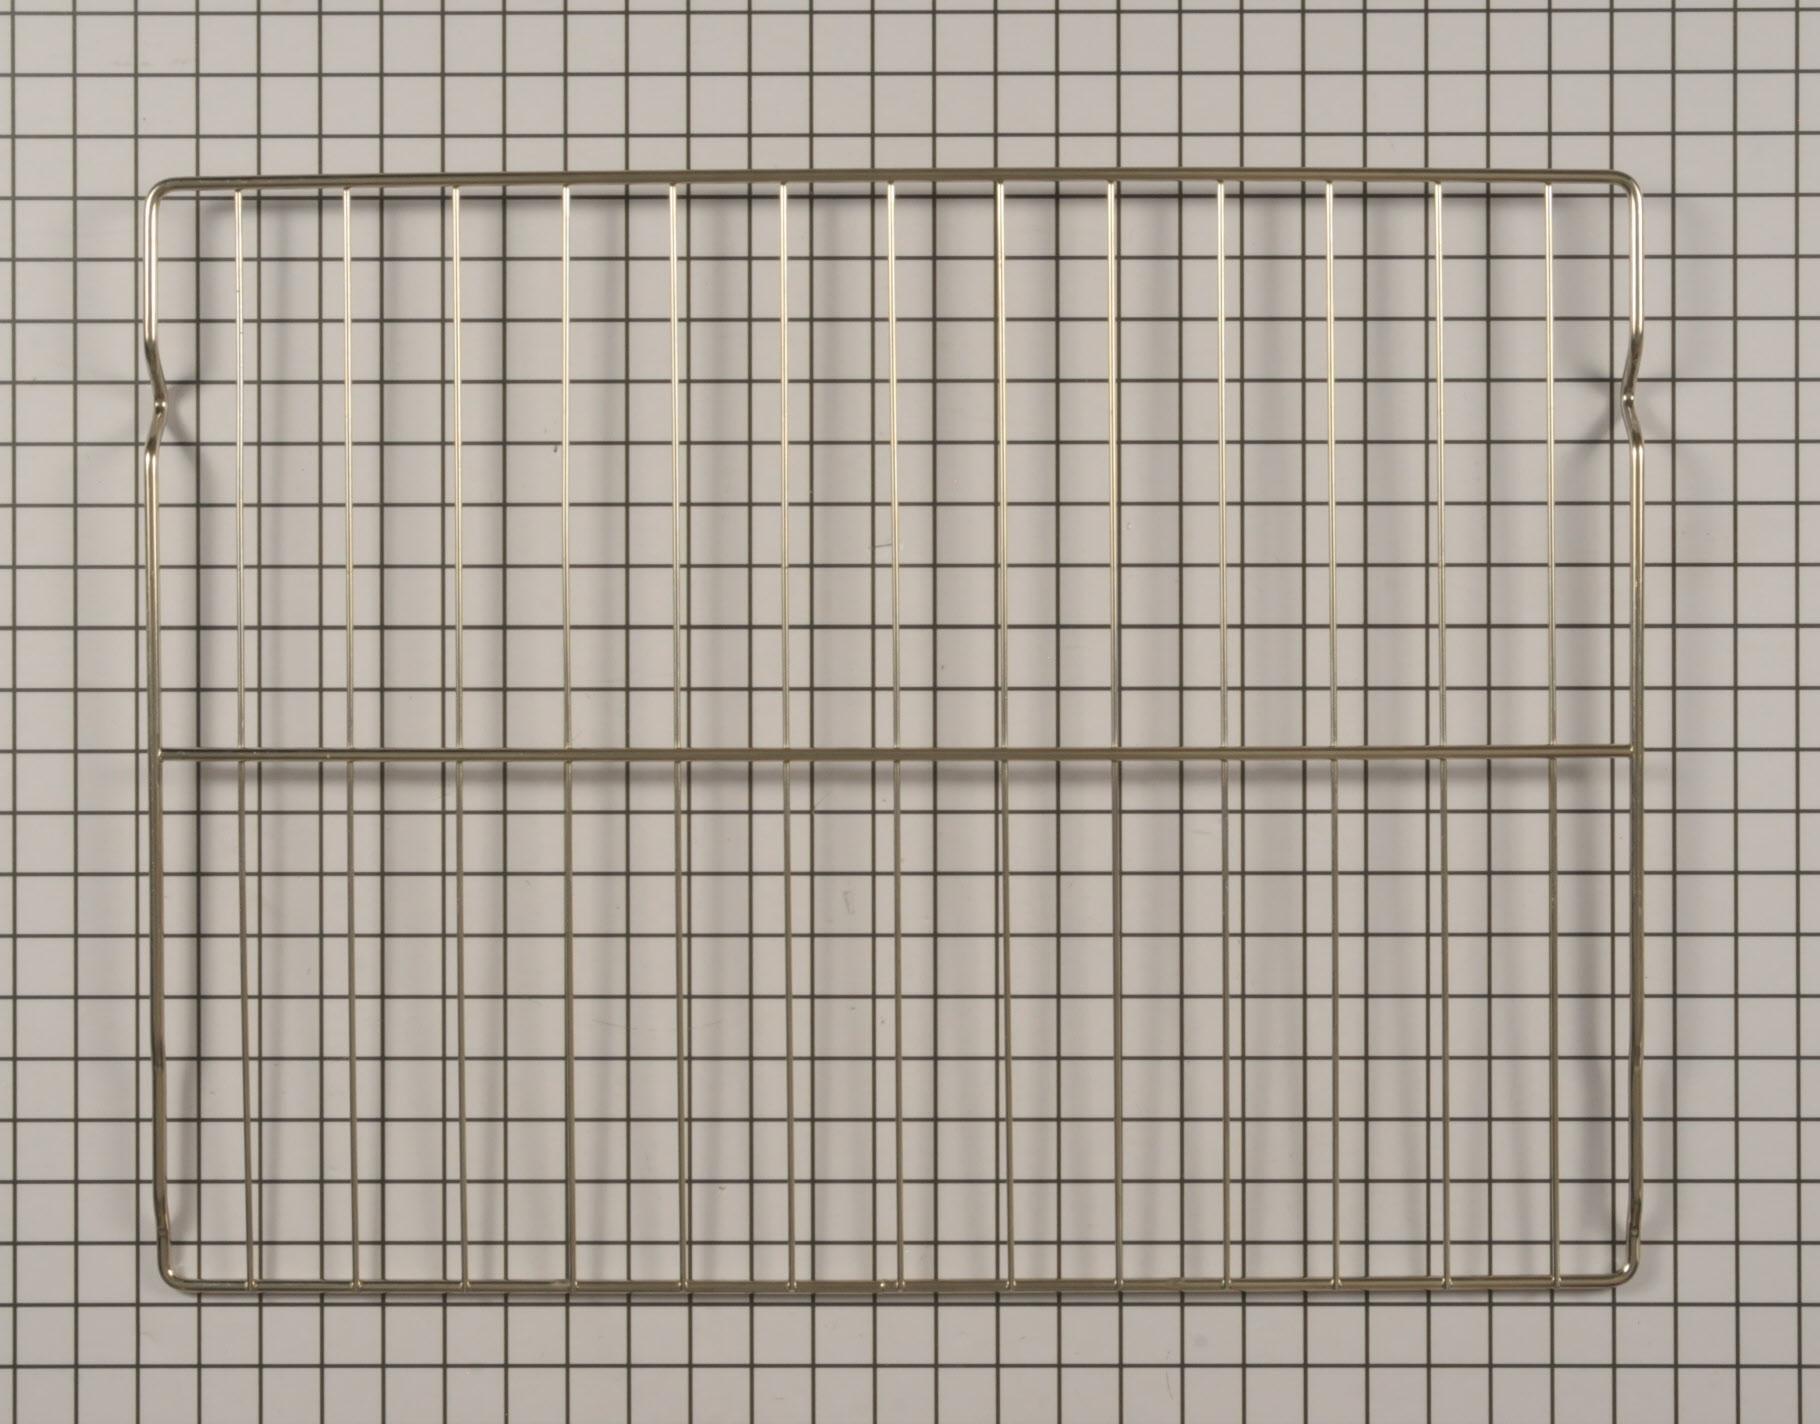 Ikea Range/Stove/Oven Part # WPW10531060 - Rack